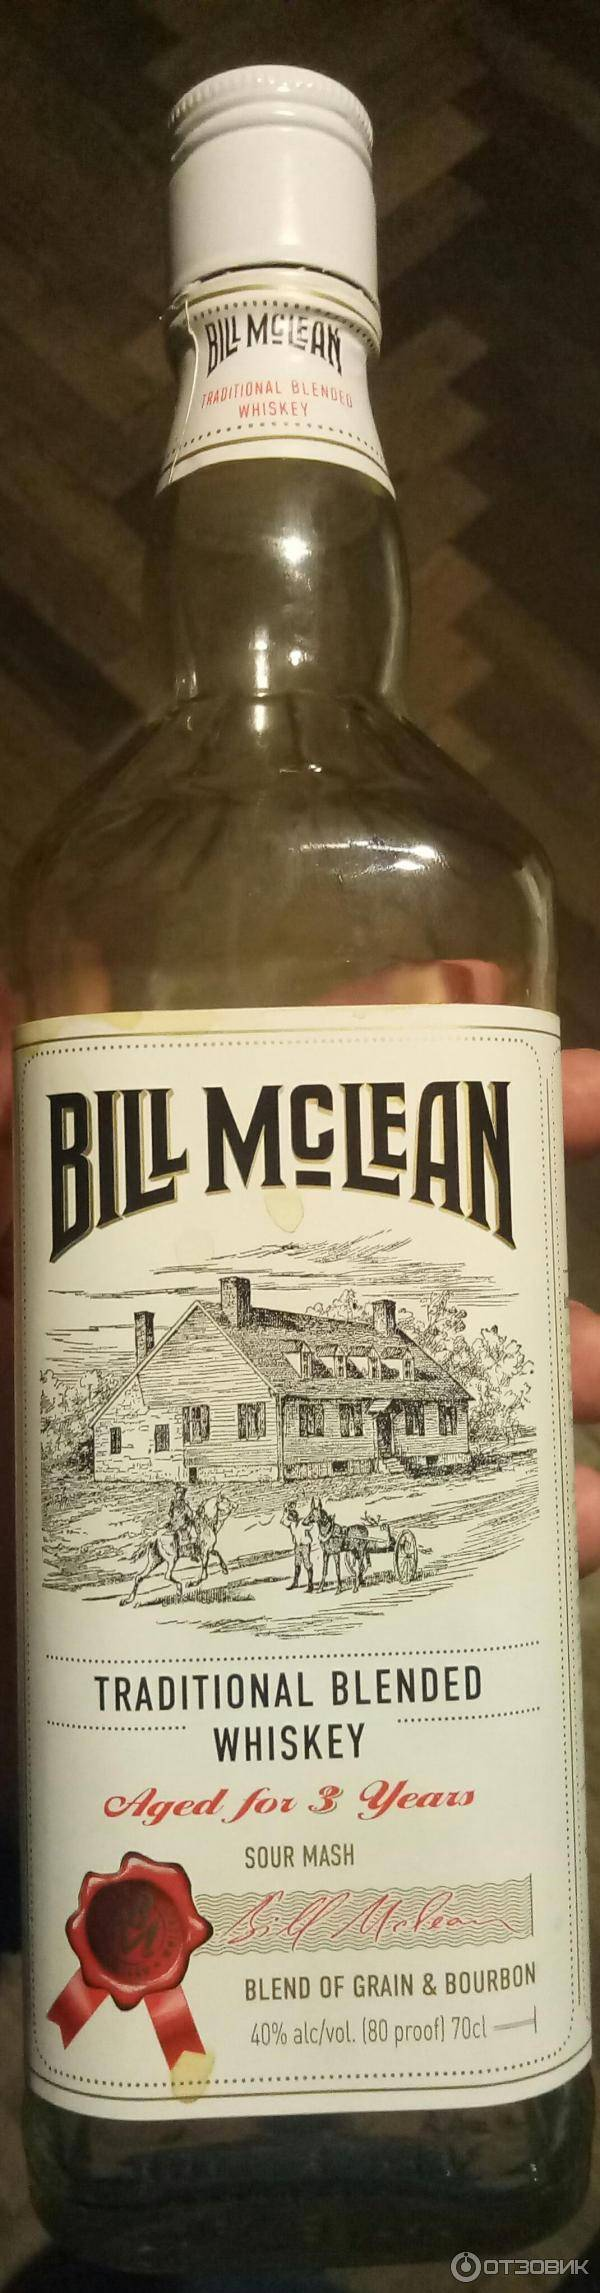 Виски bill mclean